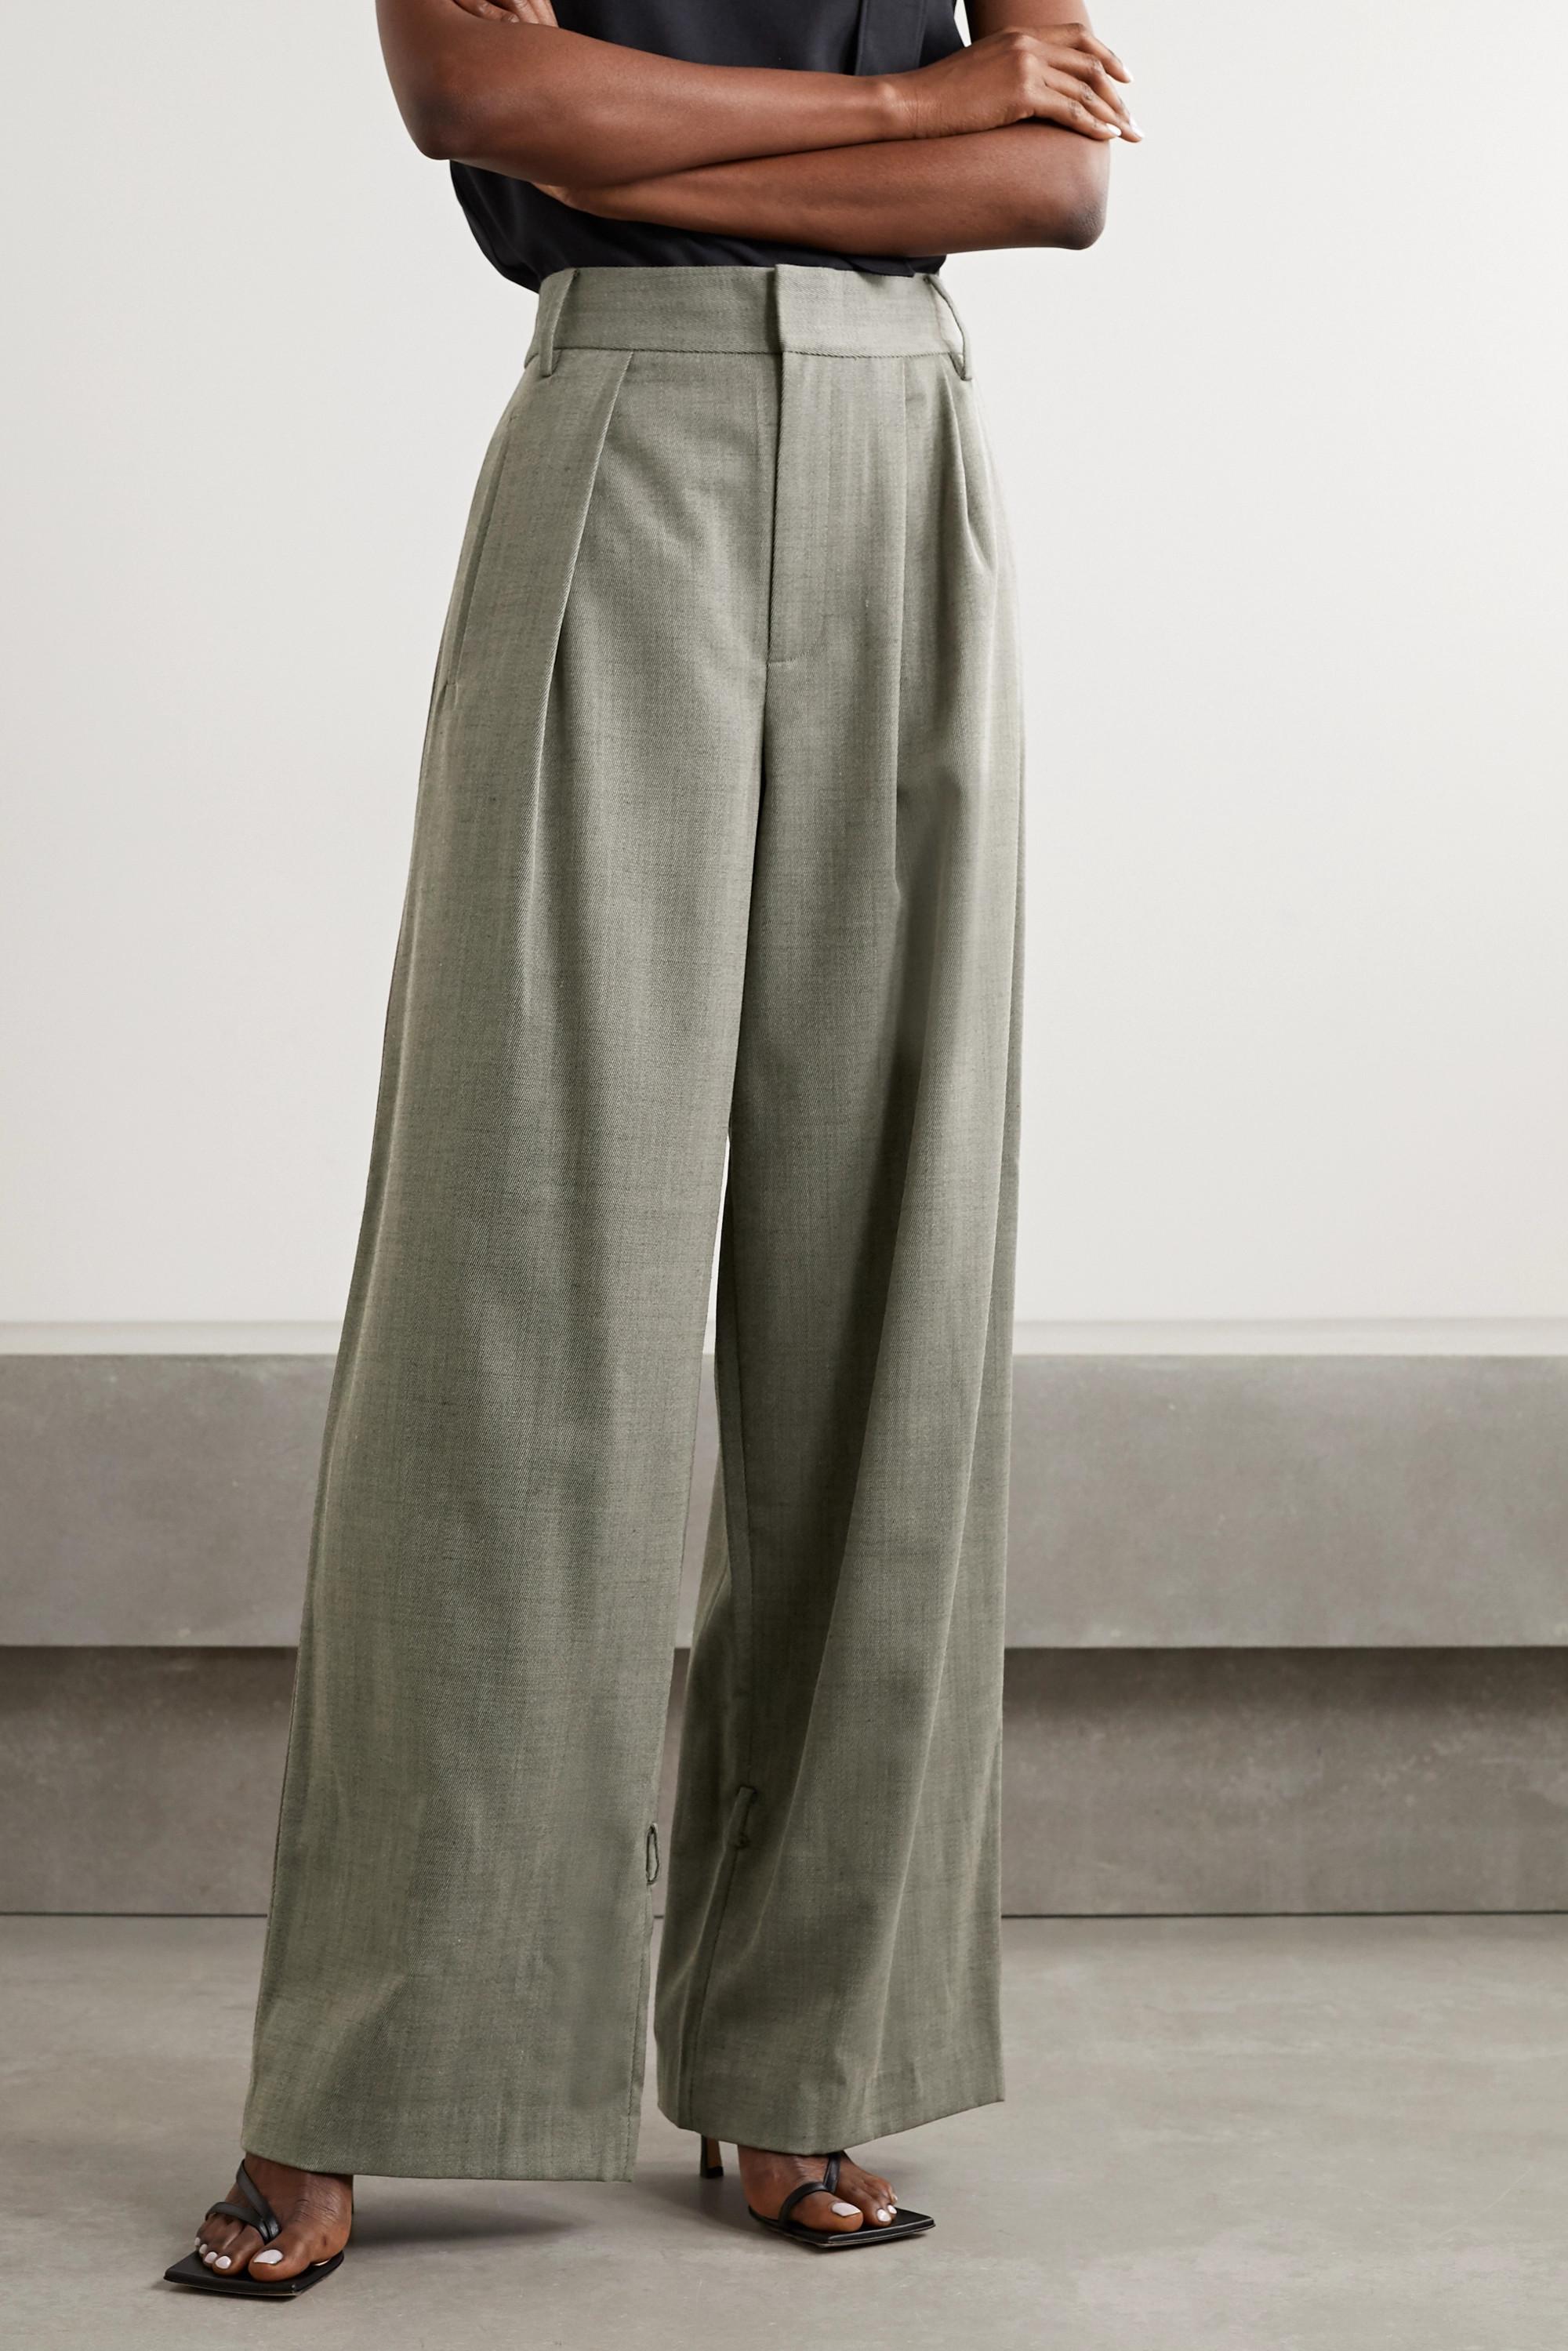 Tibi Luka pleated twill tapered pants